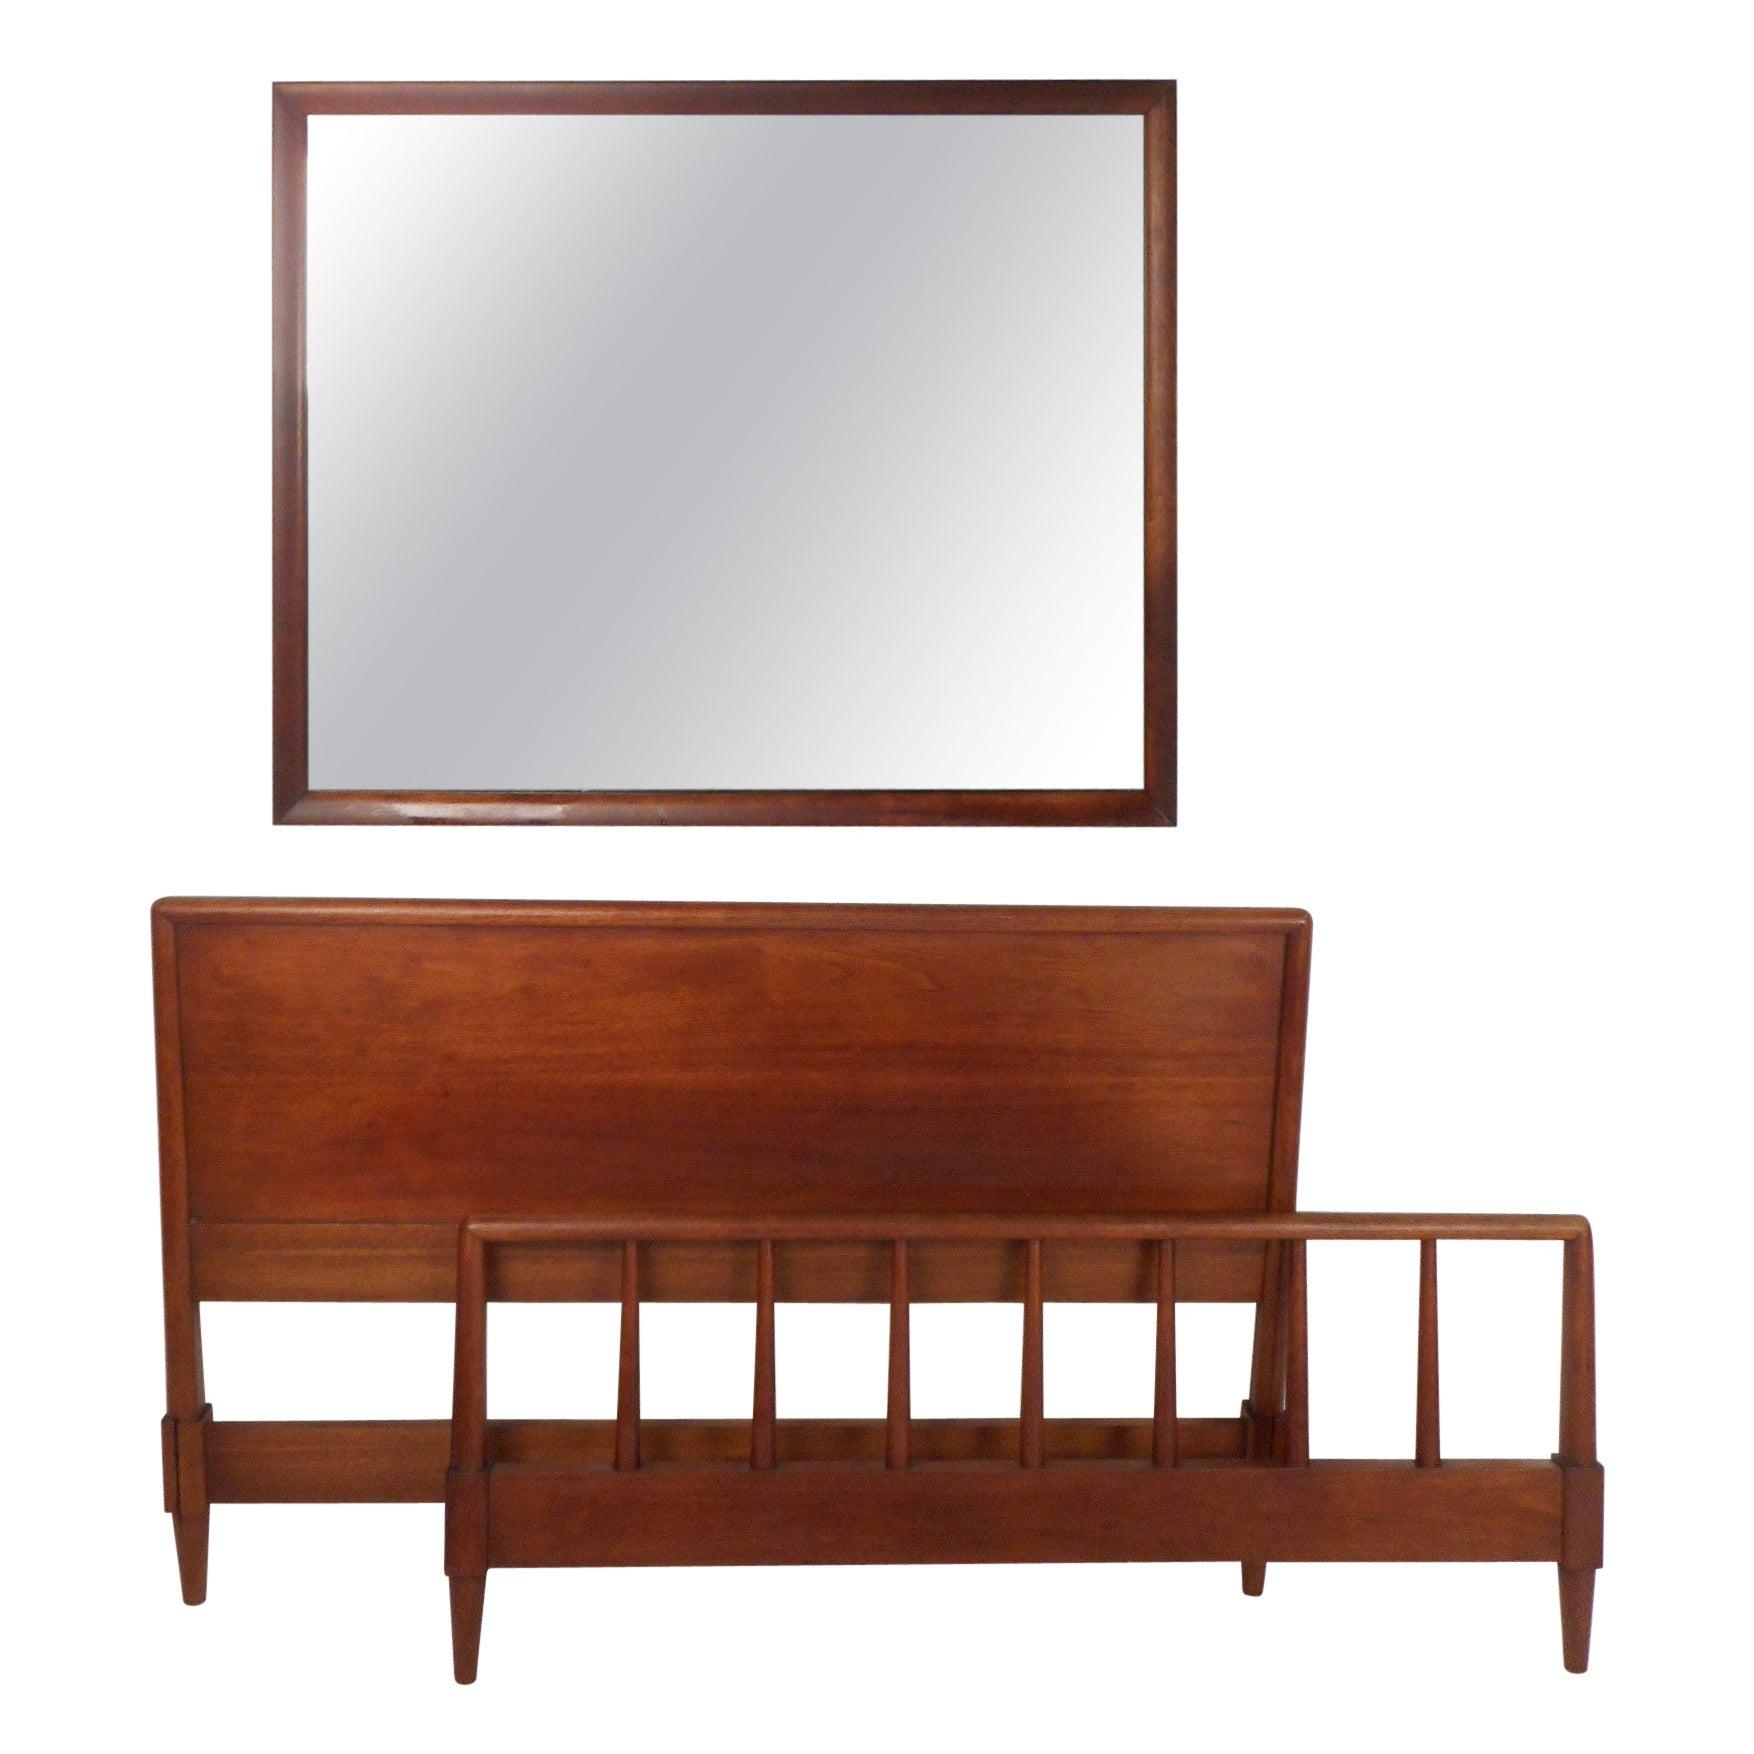 Midcentury Bed-Frame Set by Heritage-Henredon